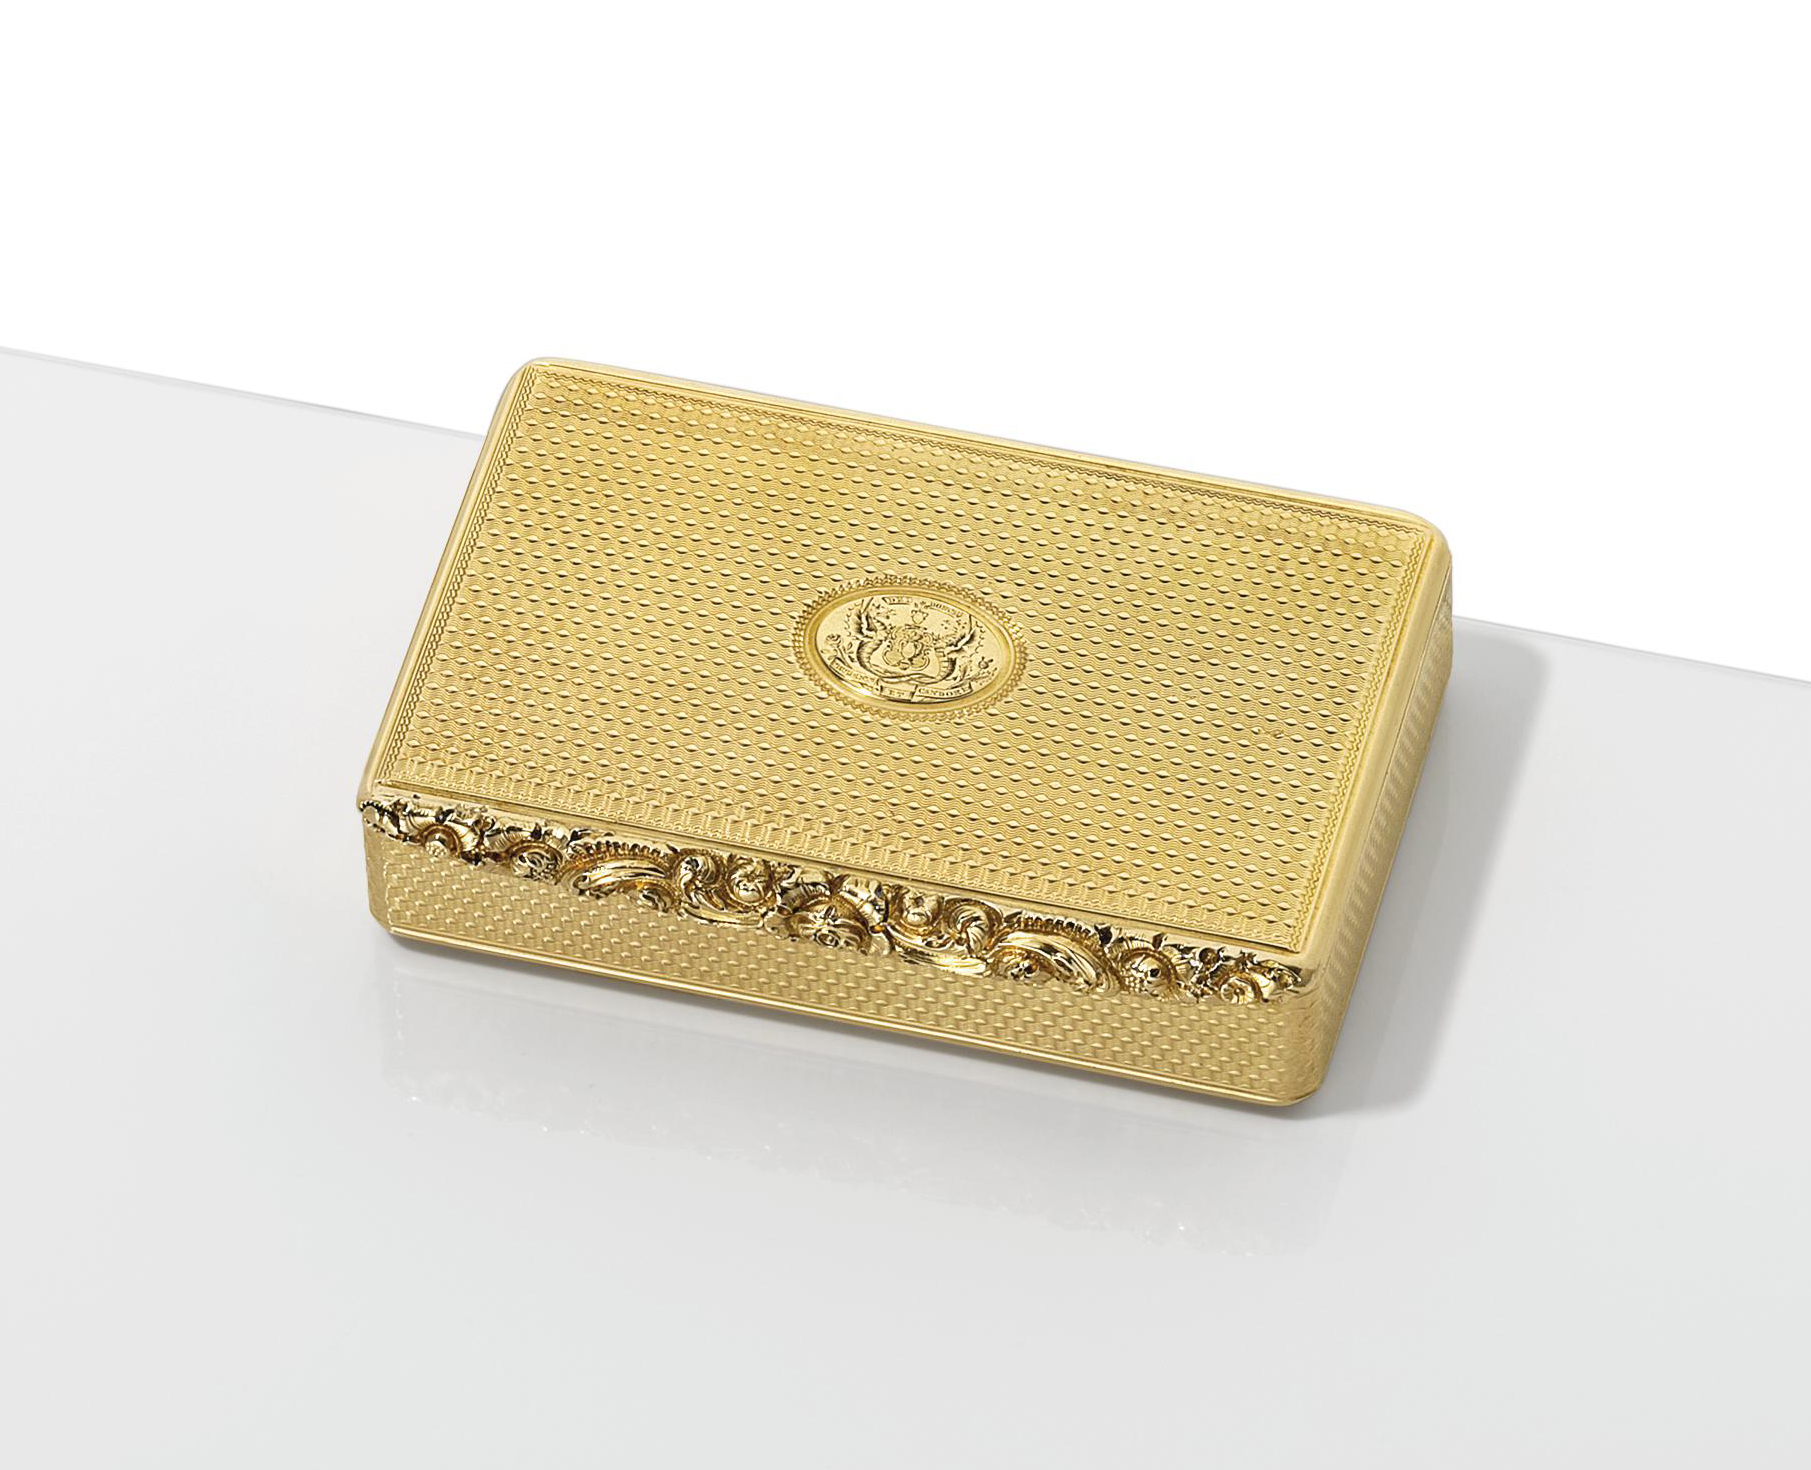 A GEORGE III GOLD SNUFF-BOX